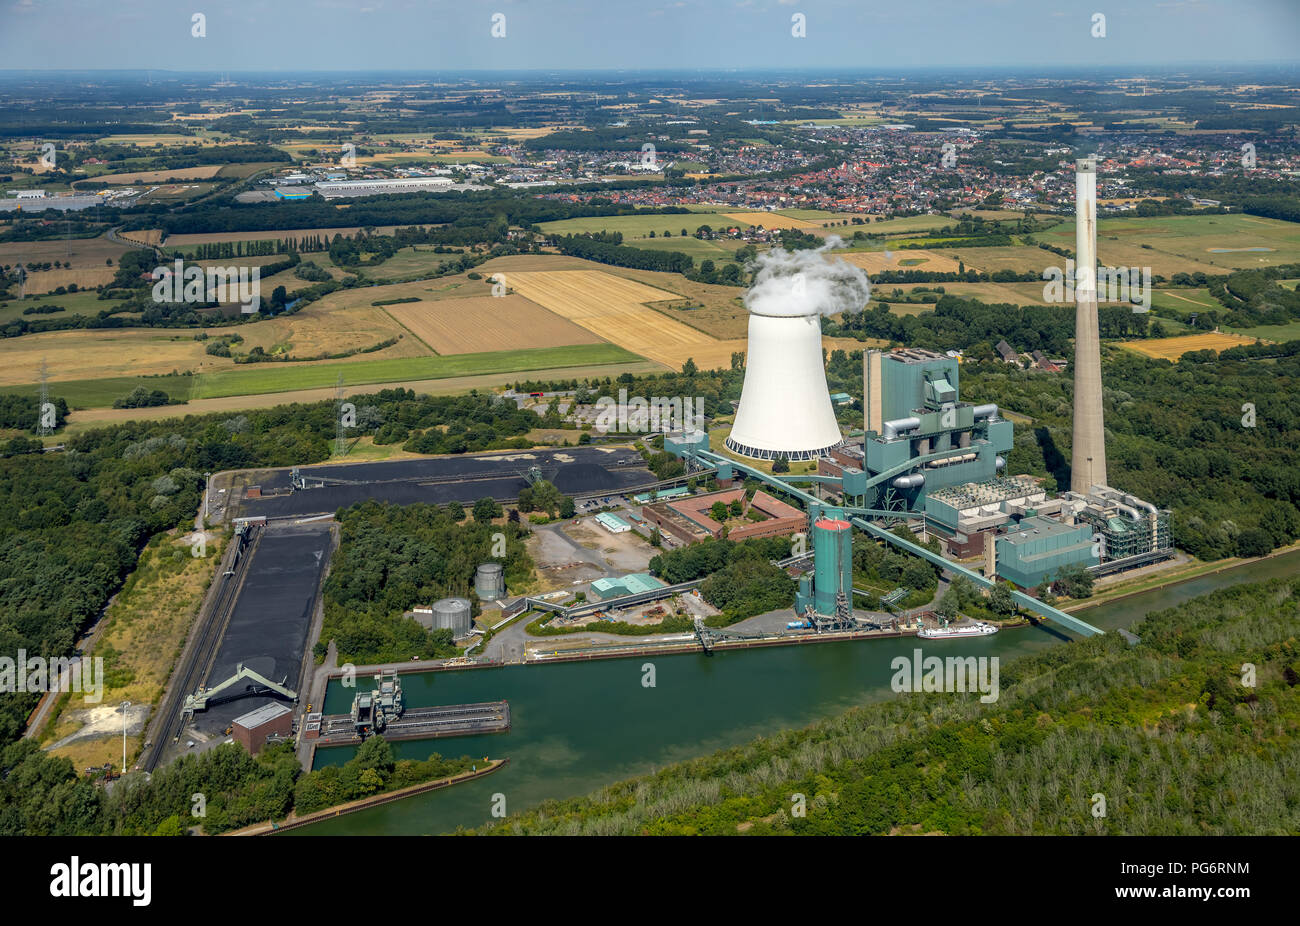 powerstation Heil, Bergkamen, Bergkamen, Ruhr aeria, North Rhine-Westphalia, Germany, DEU, Europe, aerial view, birds-eyes view, aerial view, aerial p - Stock Image